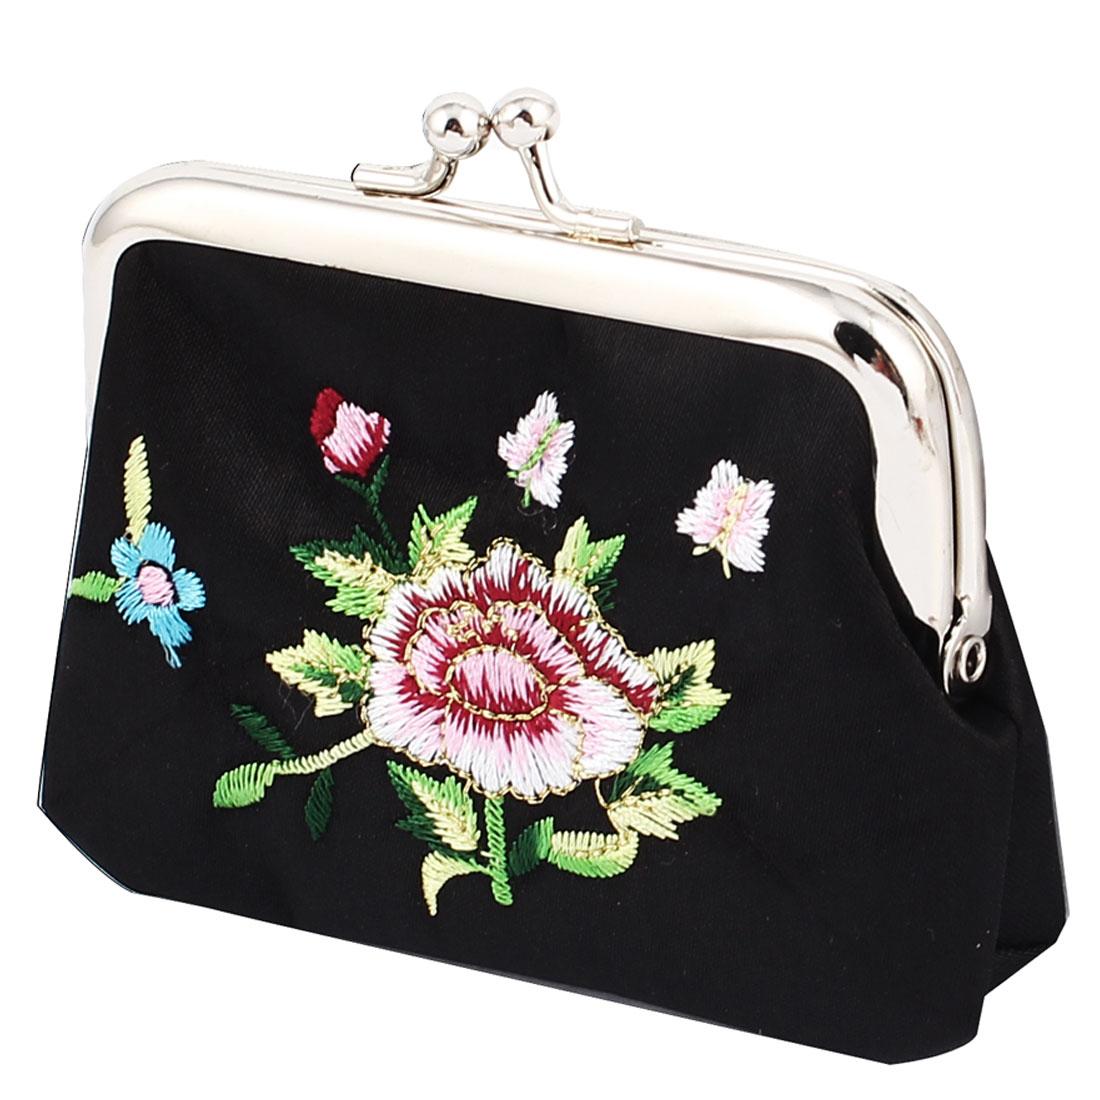 Women Floral Embroidery Kisslock Closure Bag Coin Change Purse Money Keys Holder Wallet Black